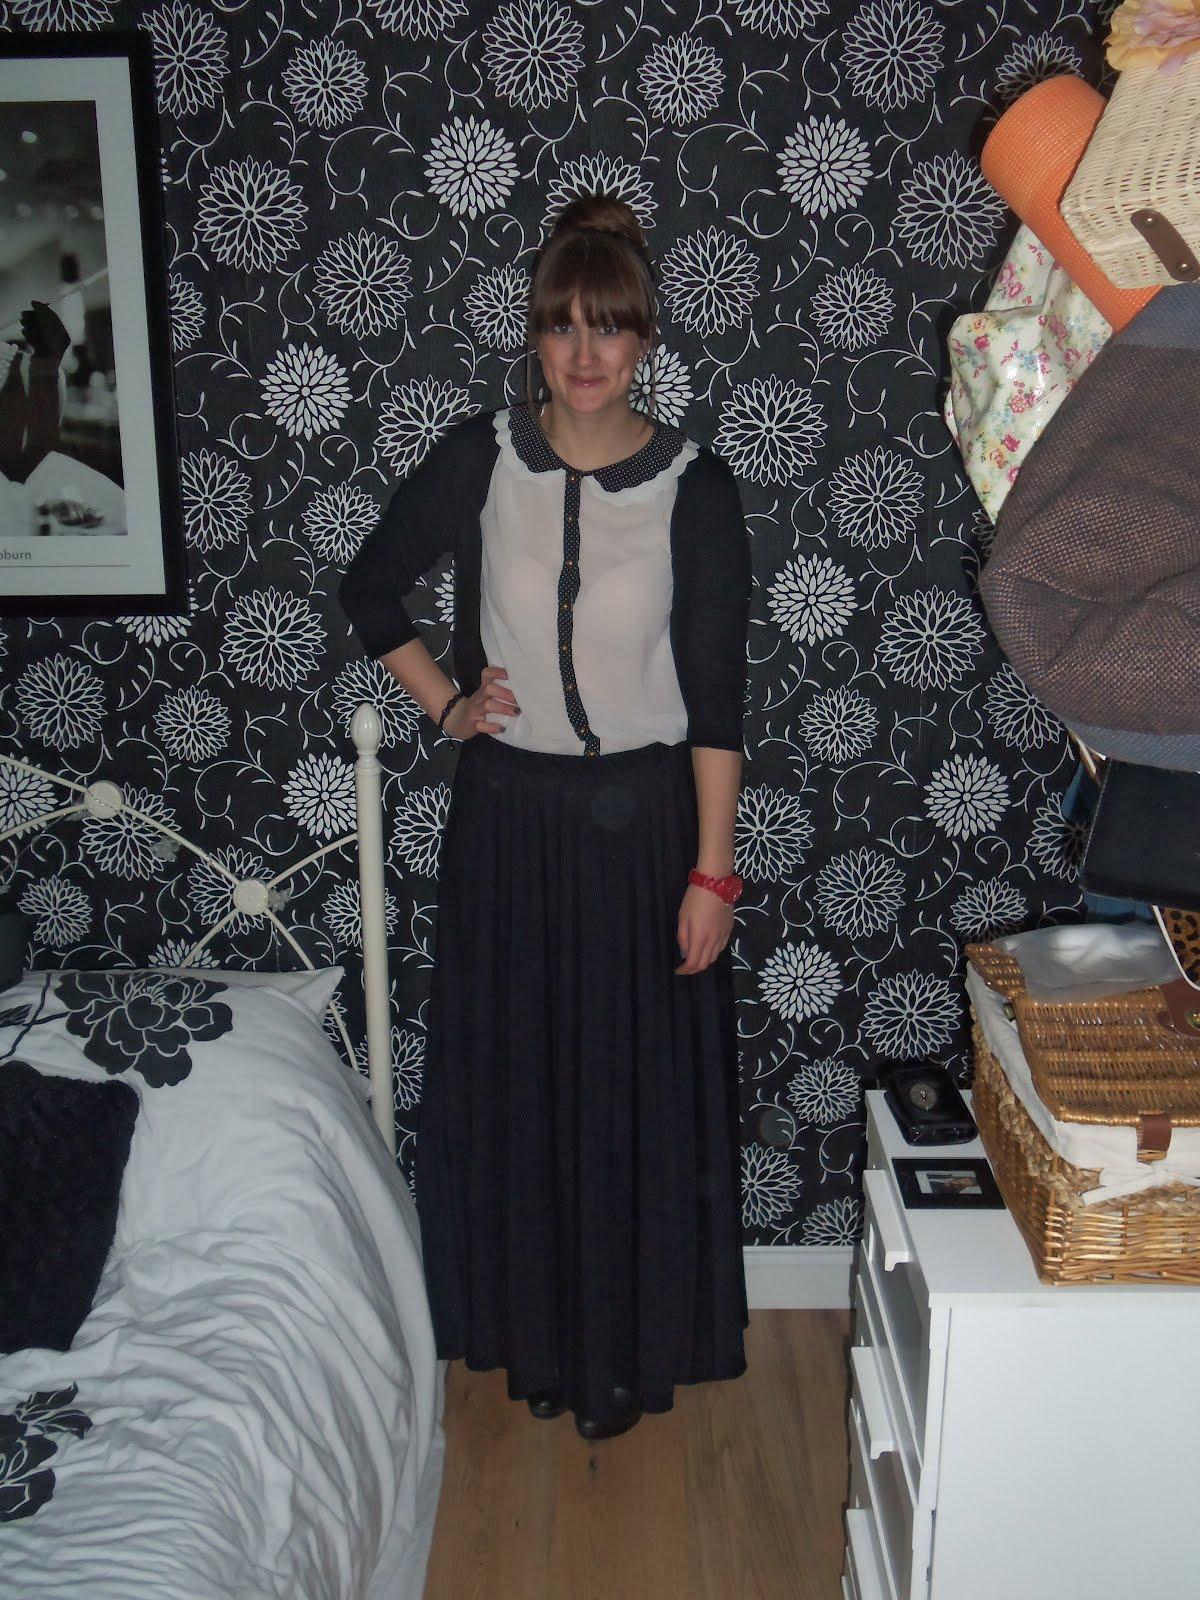 b4dcfcba5 Polka dot peter pan collar sheer shirt: Primark - gift. Black 3/4 length  cardigan: Primark Black pleated jersey maxi skirt: Clothing at Tesco